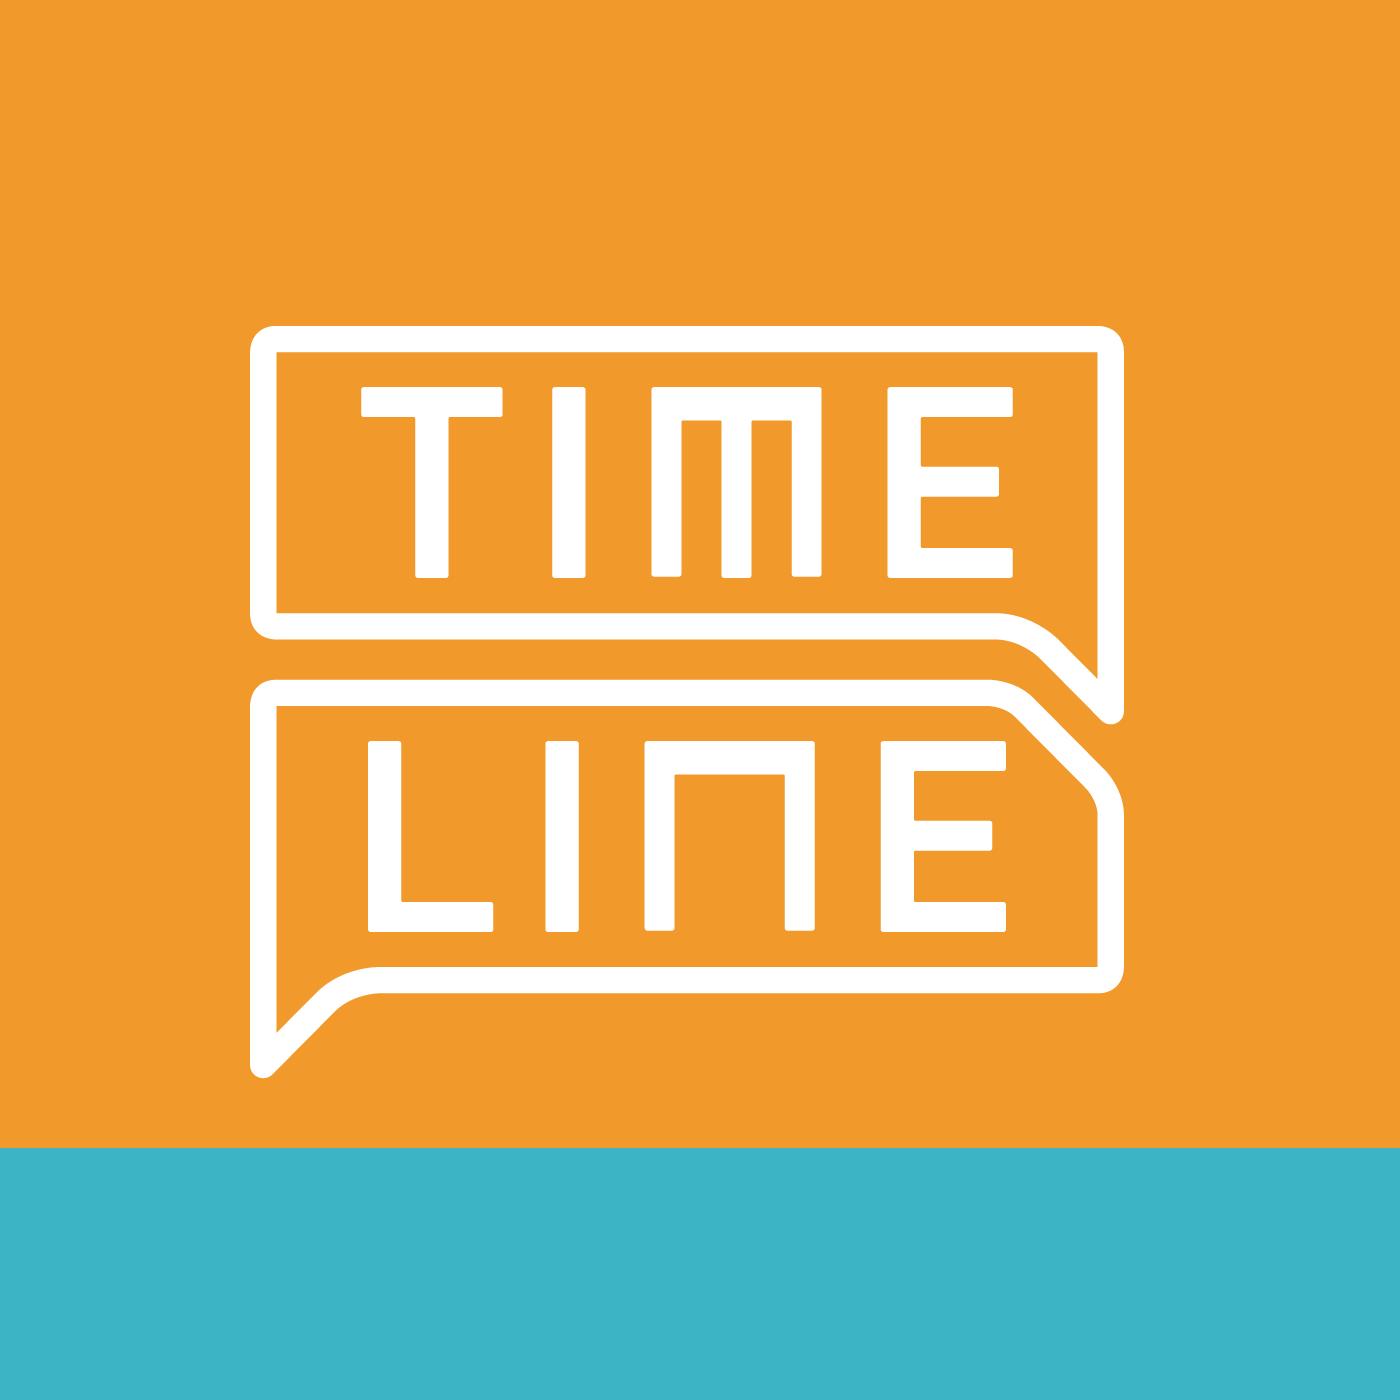 Timeline Gaúcha 17/10/2017